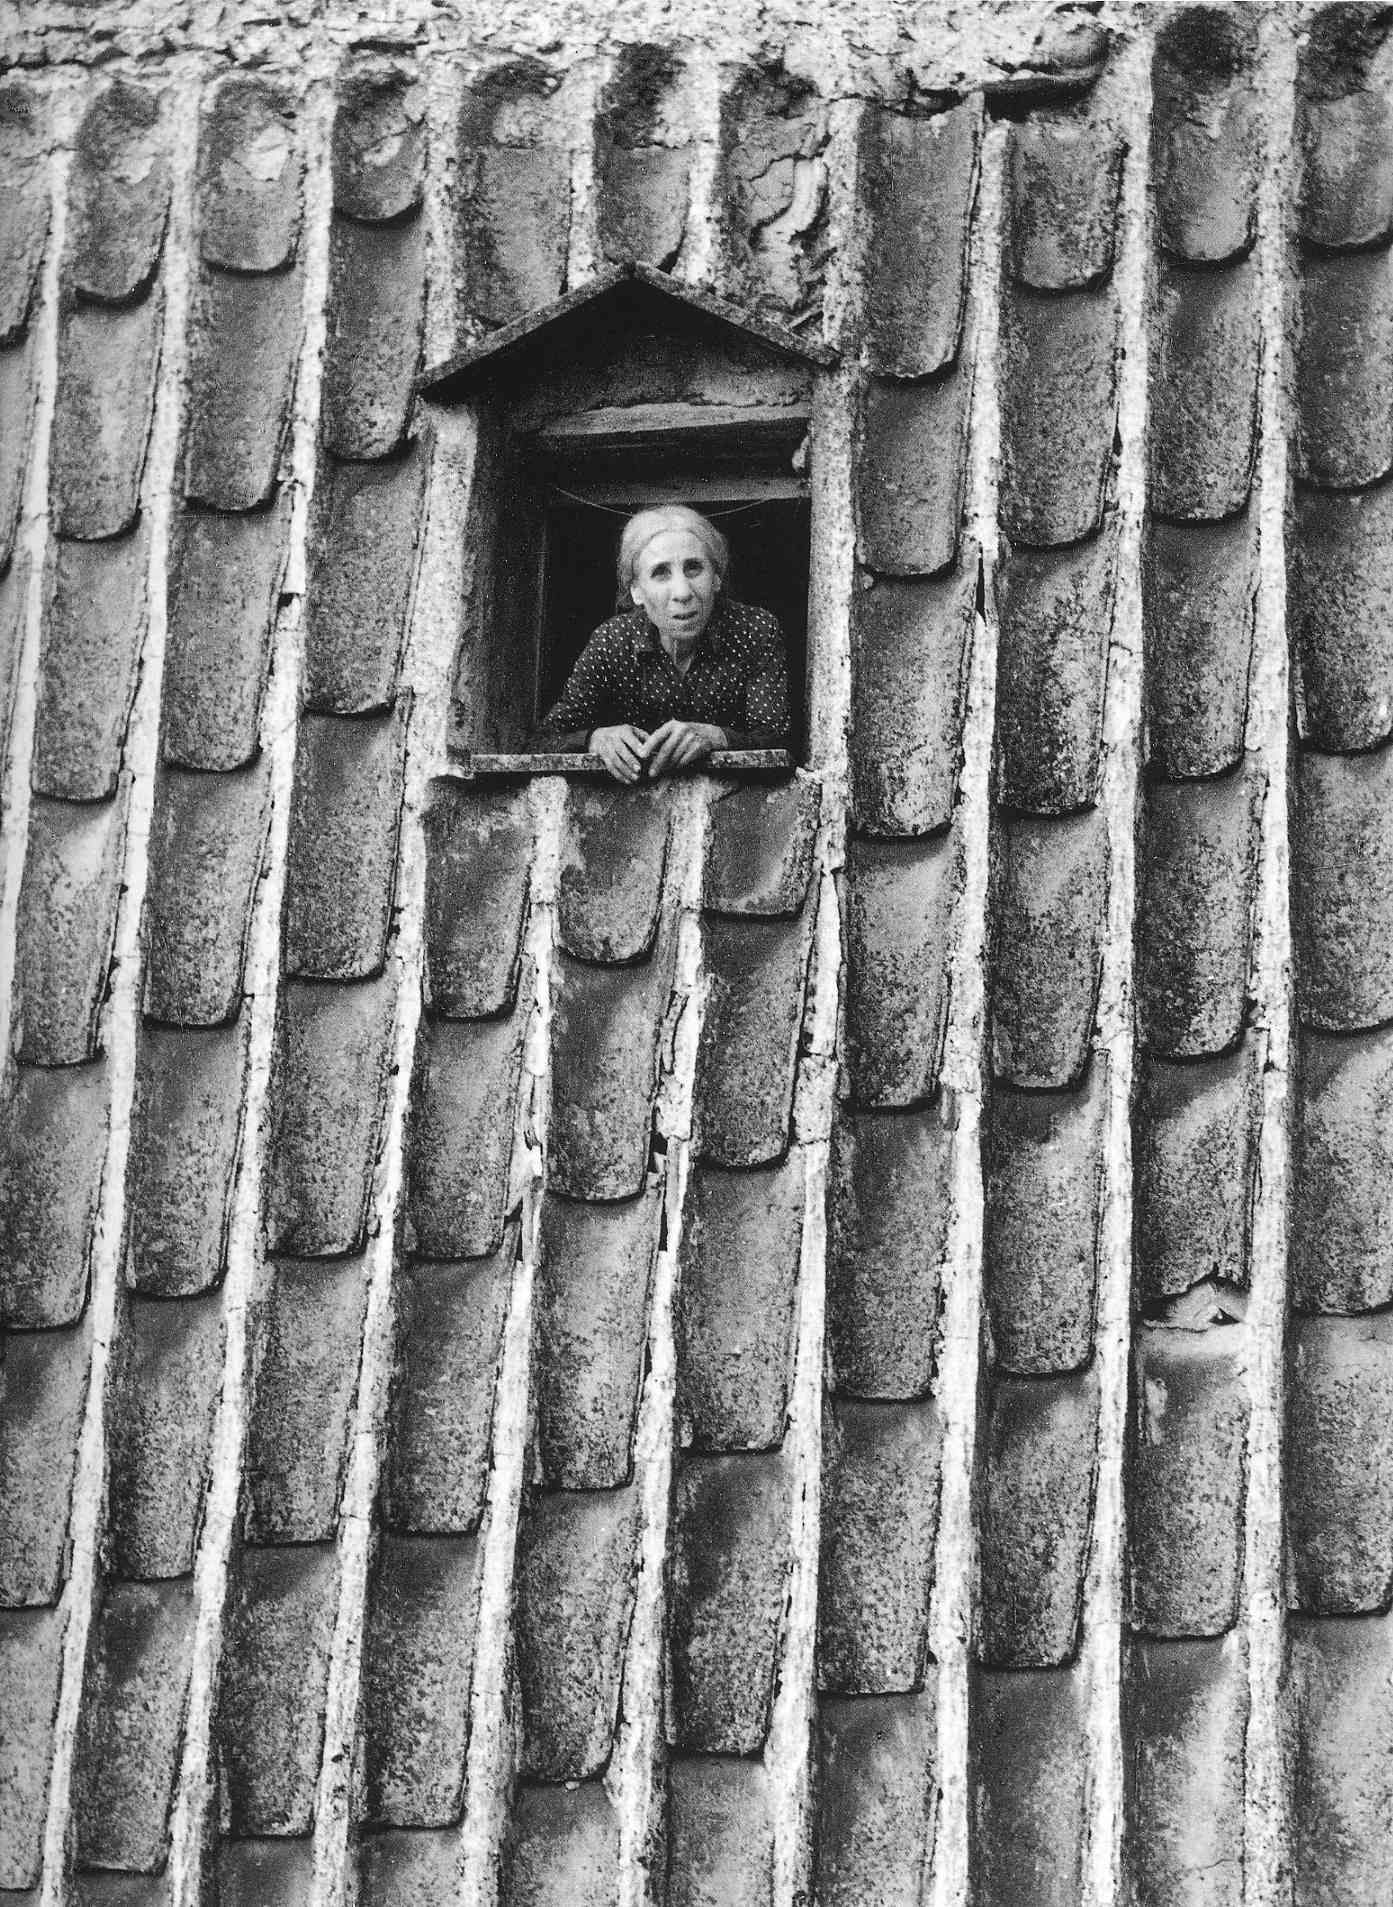 Enzo Sellerio - A Photographer In Sicity